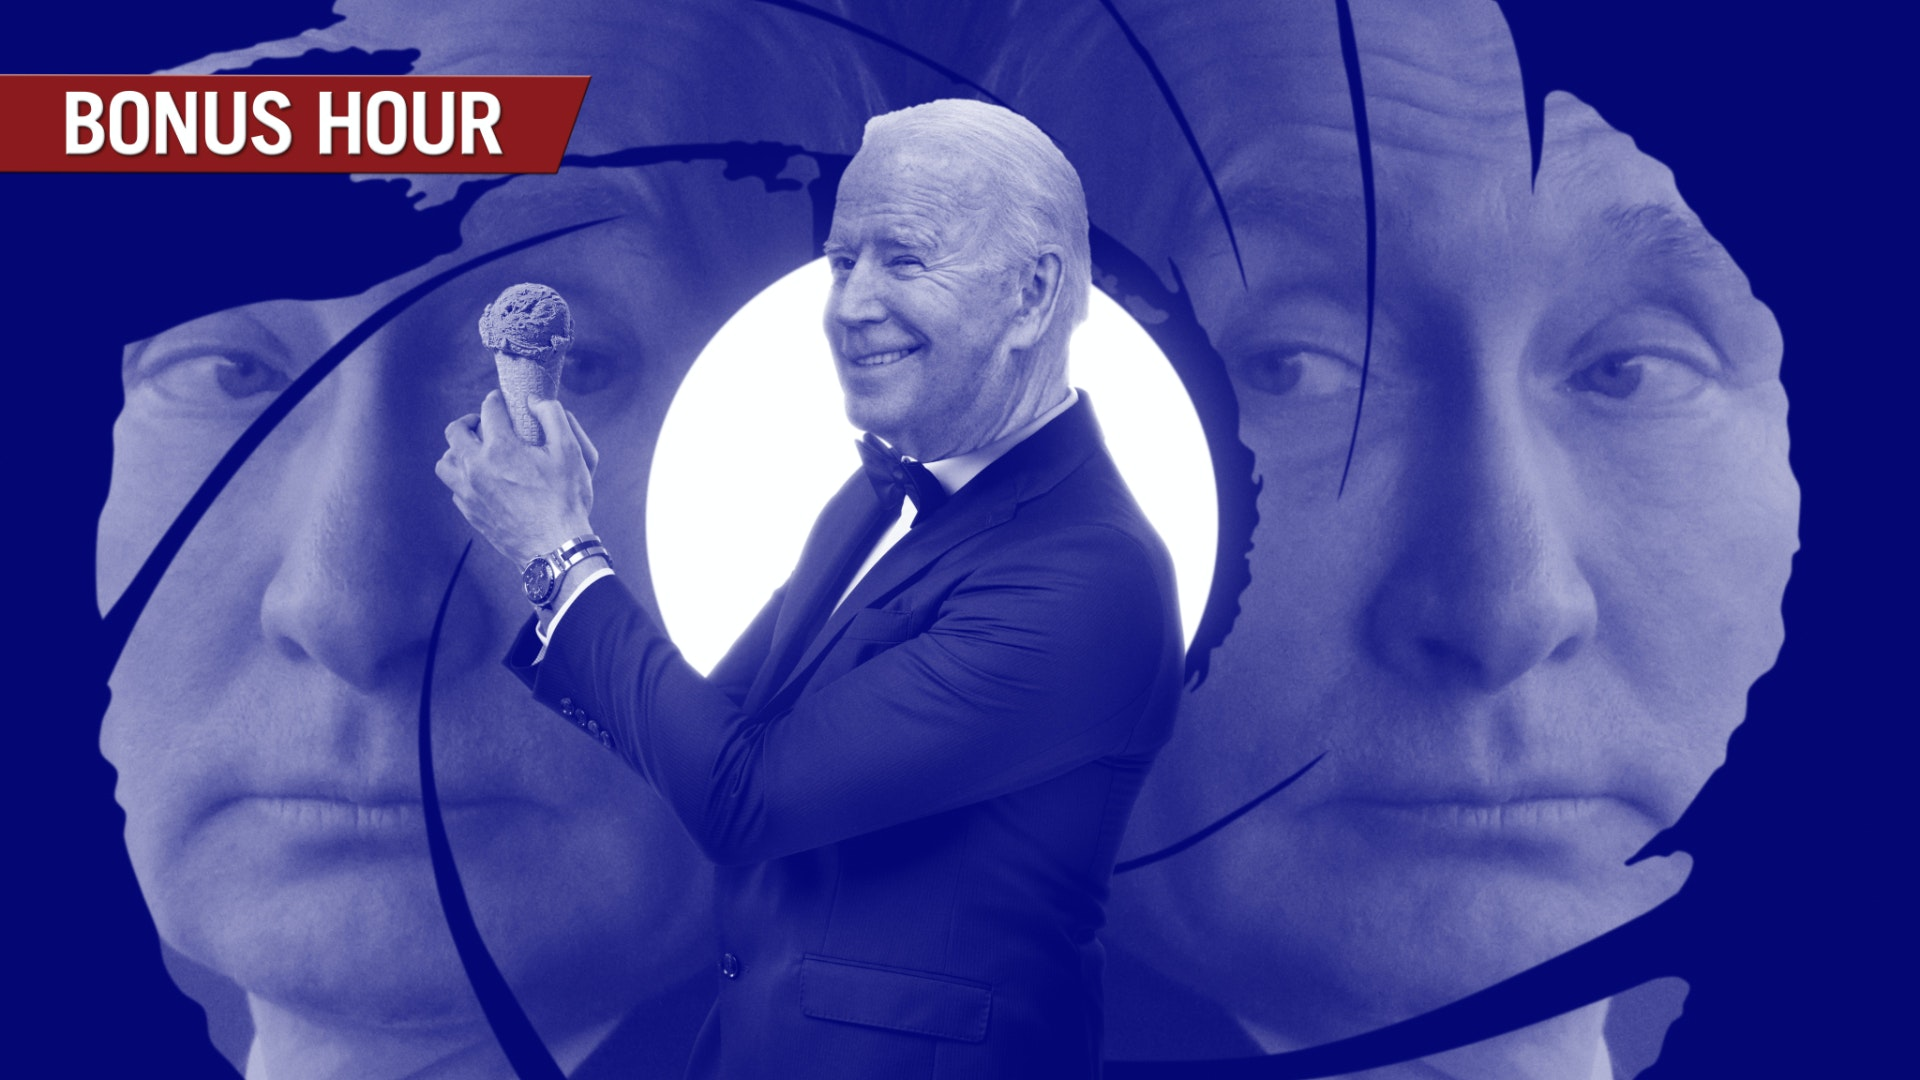 Ep. 1278 - Old Joe Meets The Bond Villain [Bonus Hour]